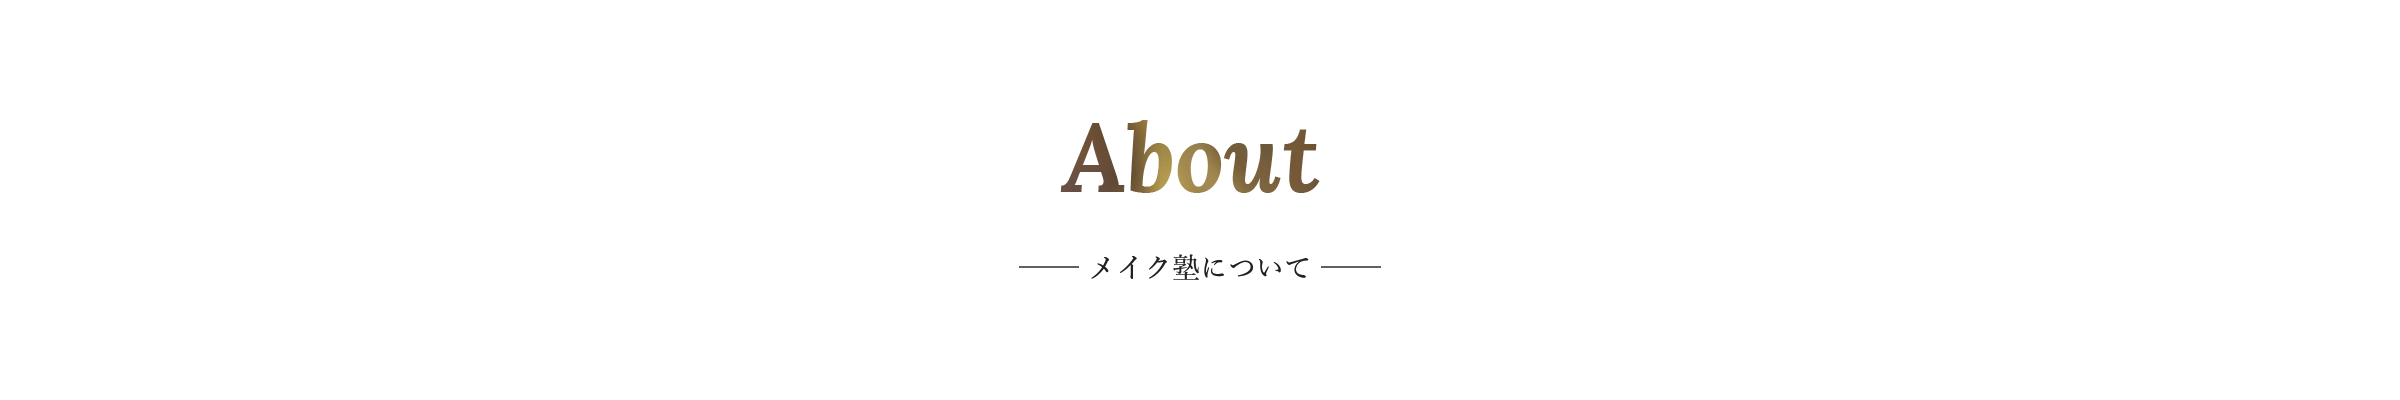 About-メイク塾について-